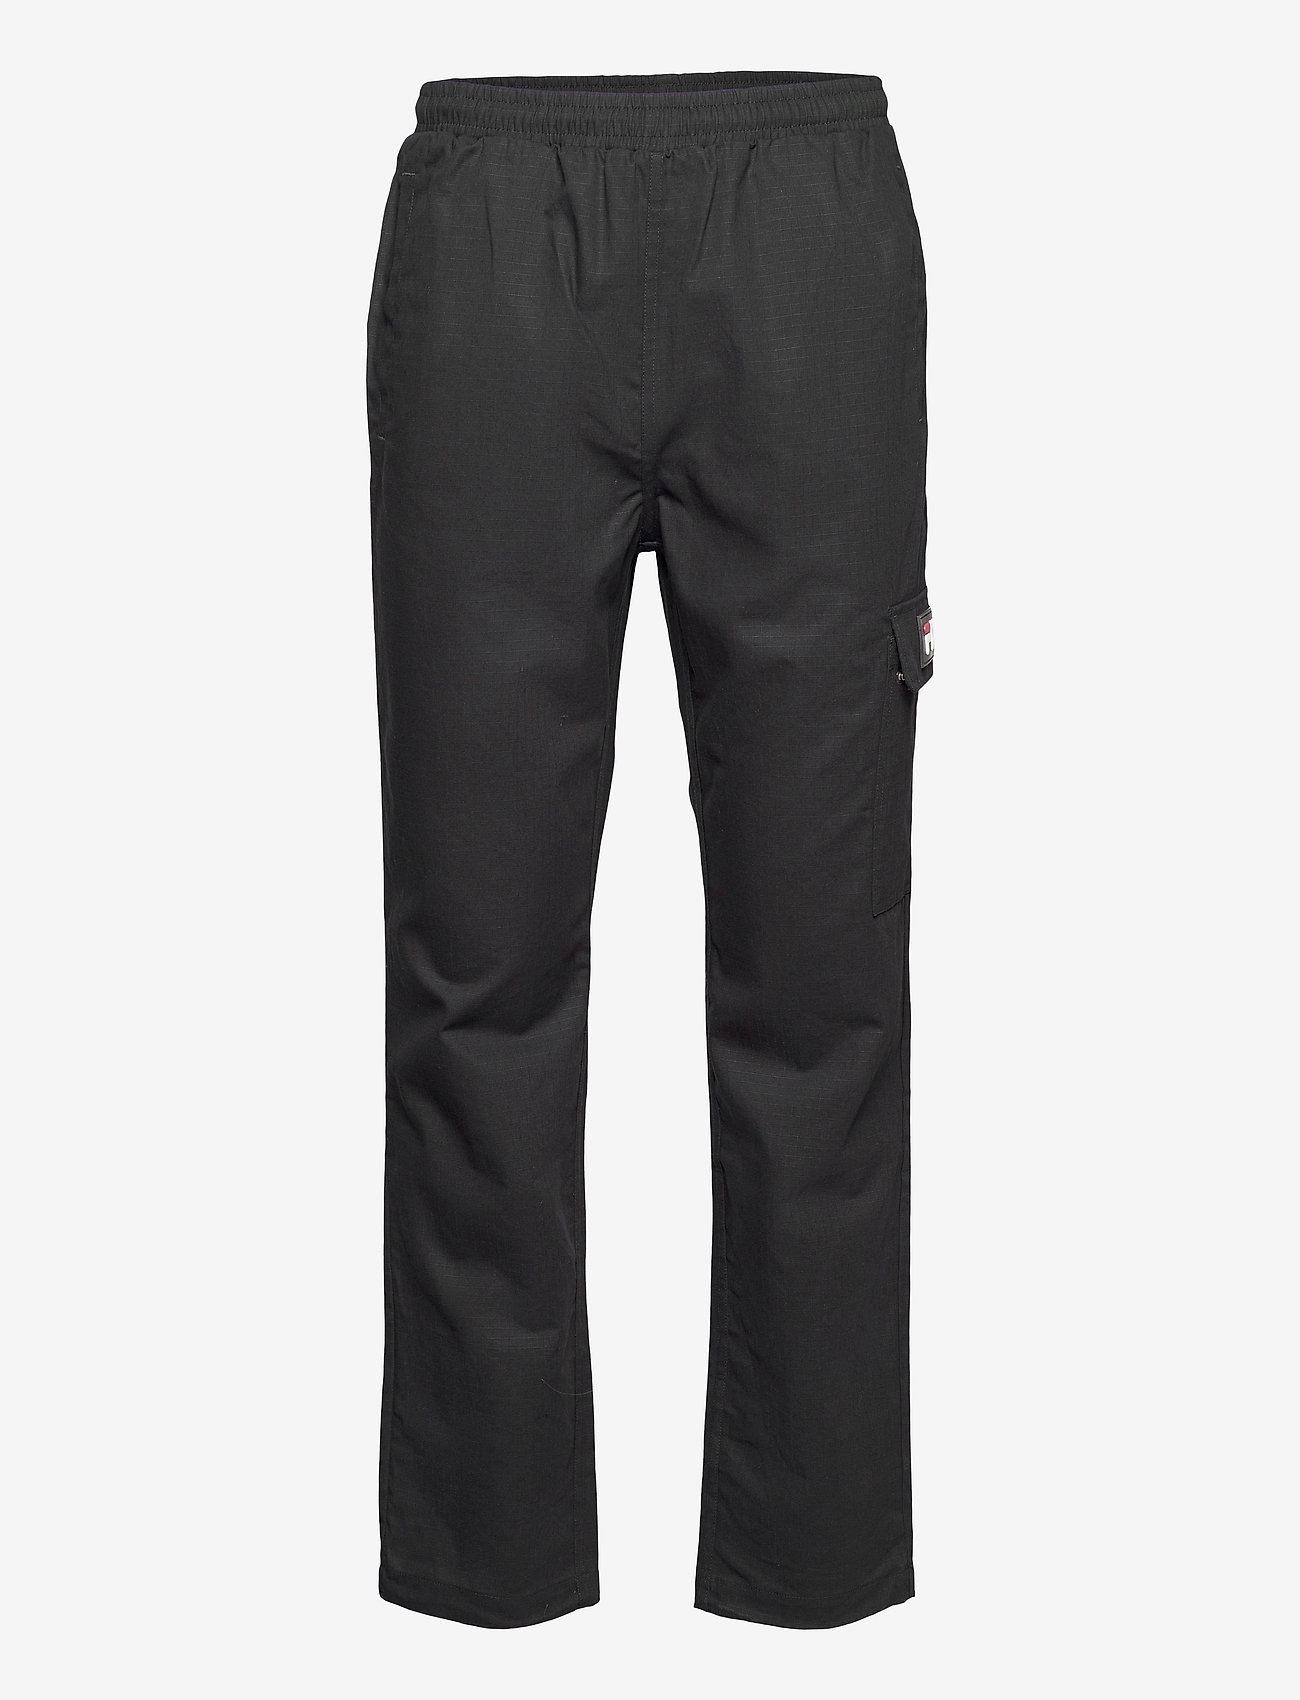 FILA - MEN CLEAVE cargo pants - pantalon cargo - black - 0